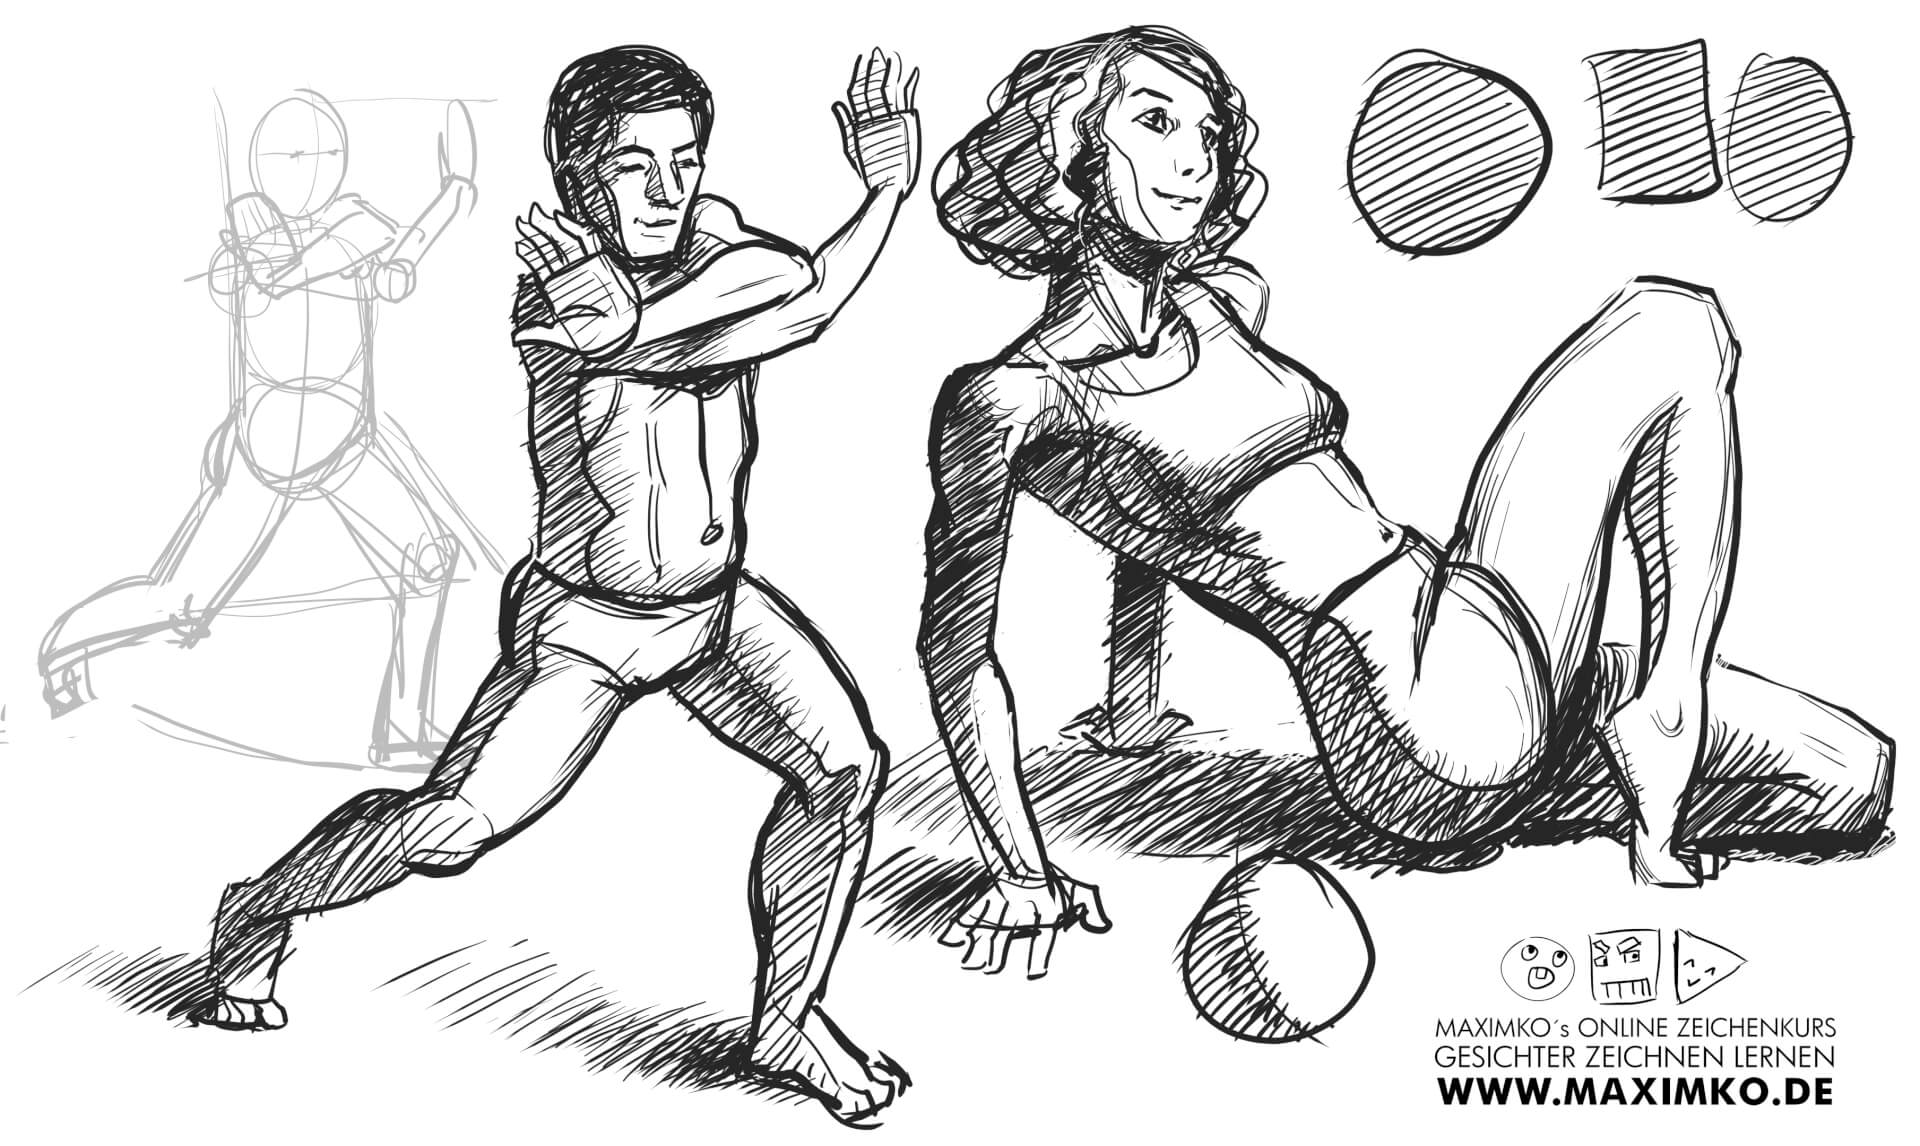 körper zeichnen posen live aktzeichnen proportionen konstruieren tutorial anleitung schritt für schritt manga comic concept art charakterdesign maxim simonenko